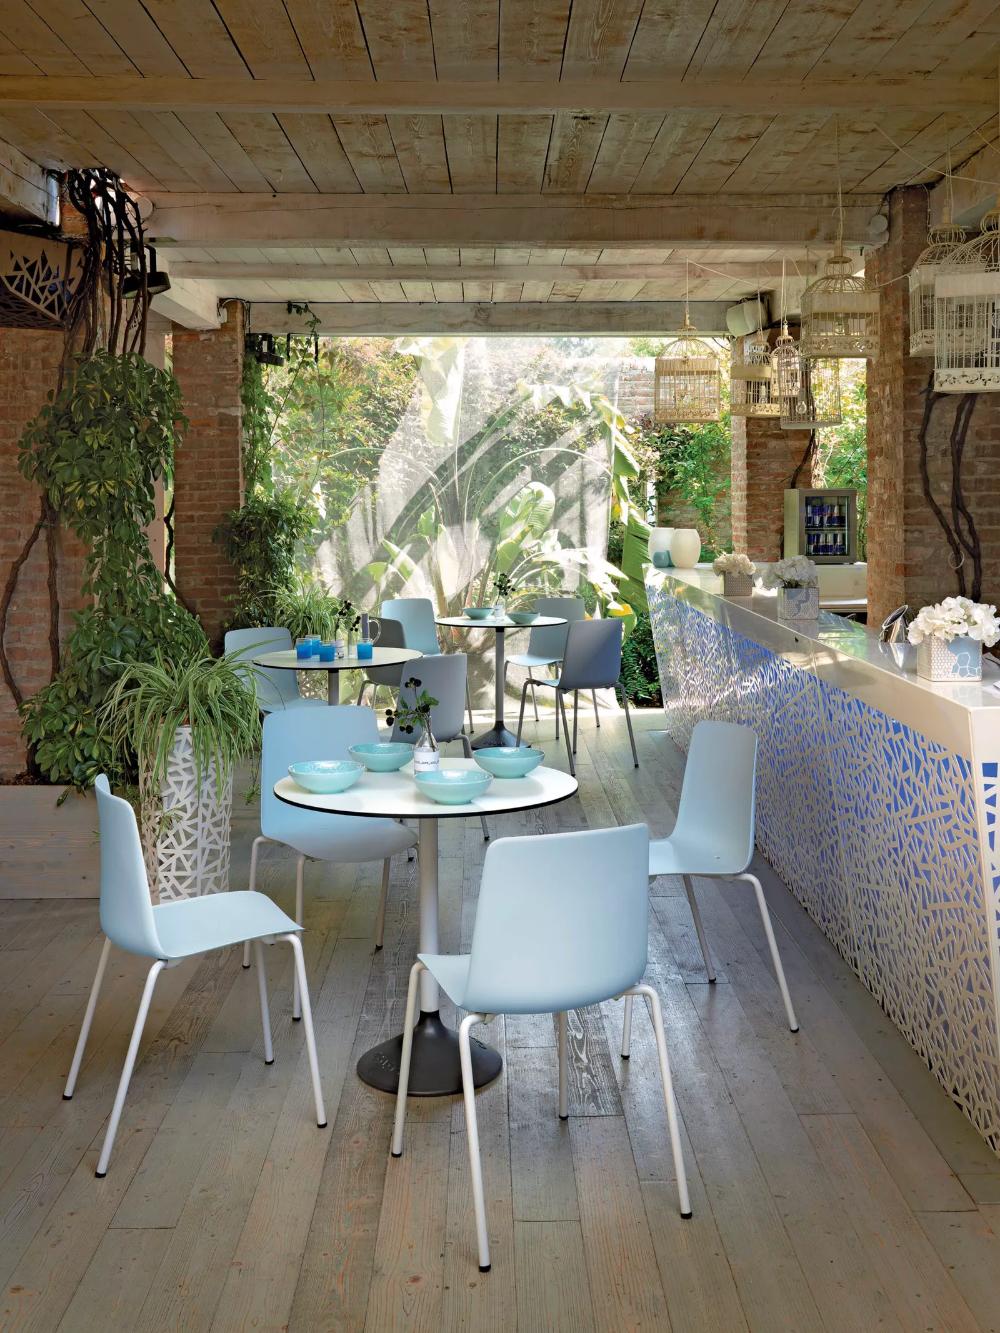 Vesper Chair Hospitality Furniture Harrows NZ